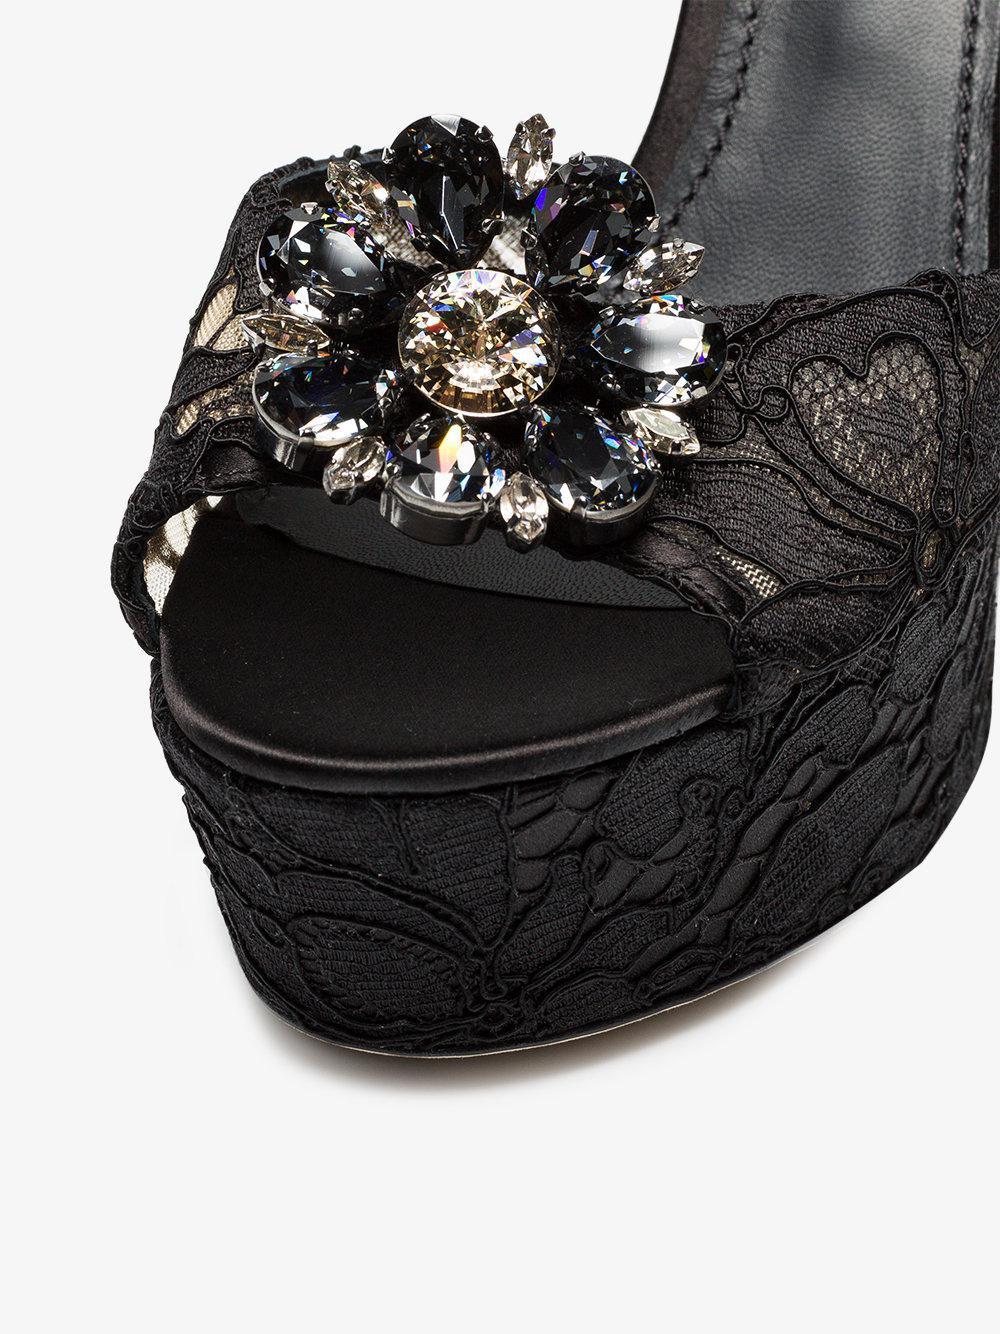 Dolce & Gabbana Keira 120 Dentelle Sandales Plateforme - Noir SDCKGy